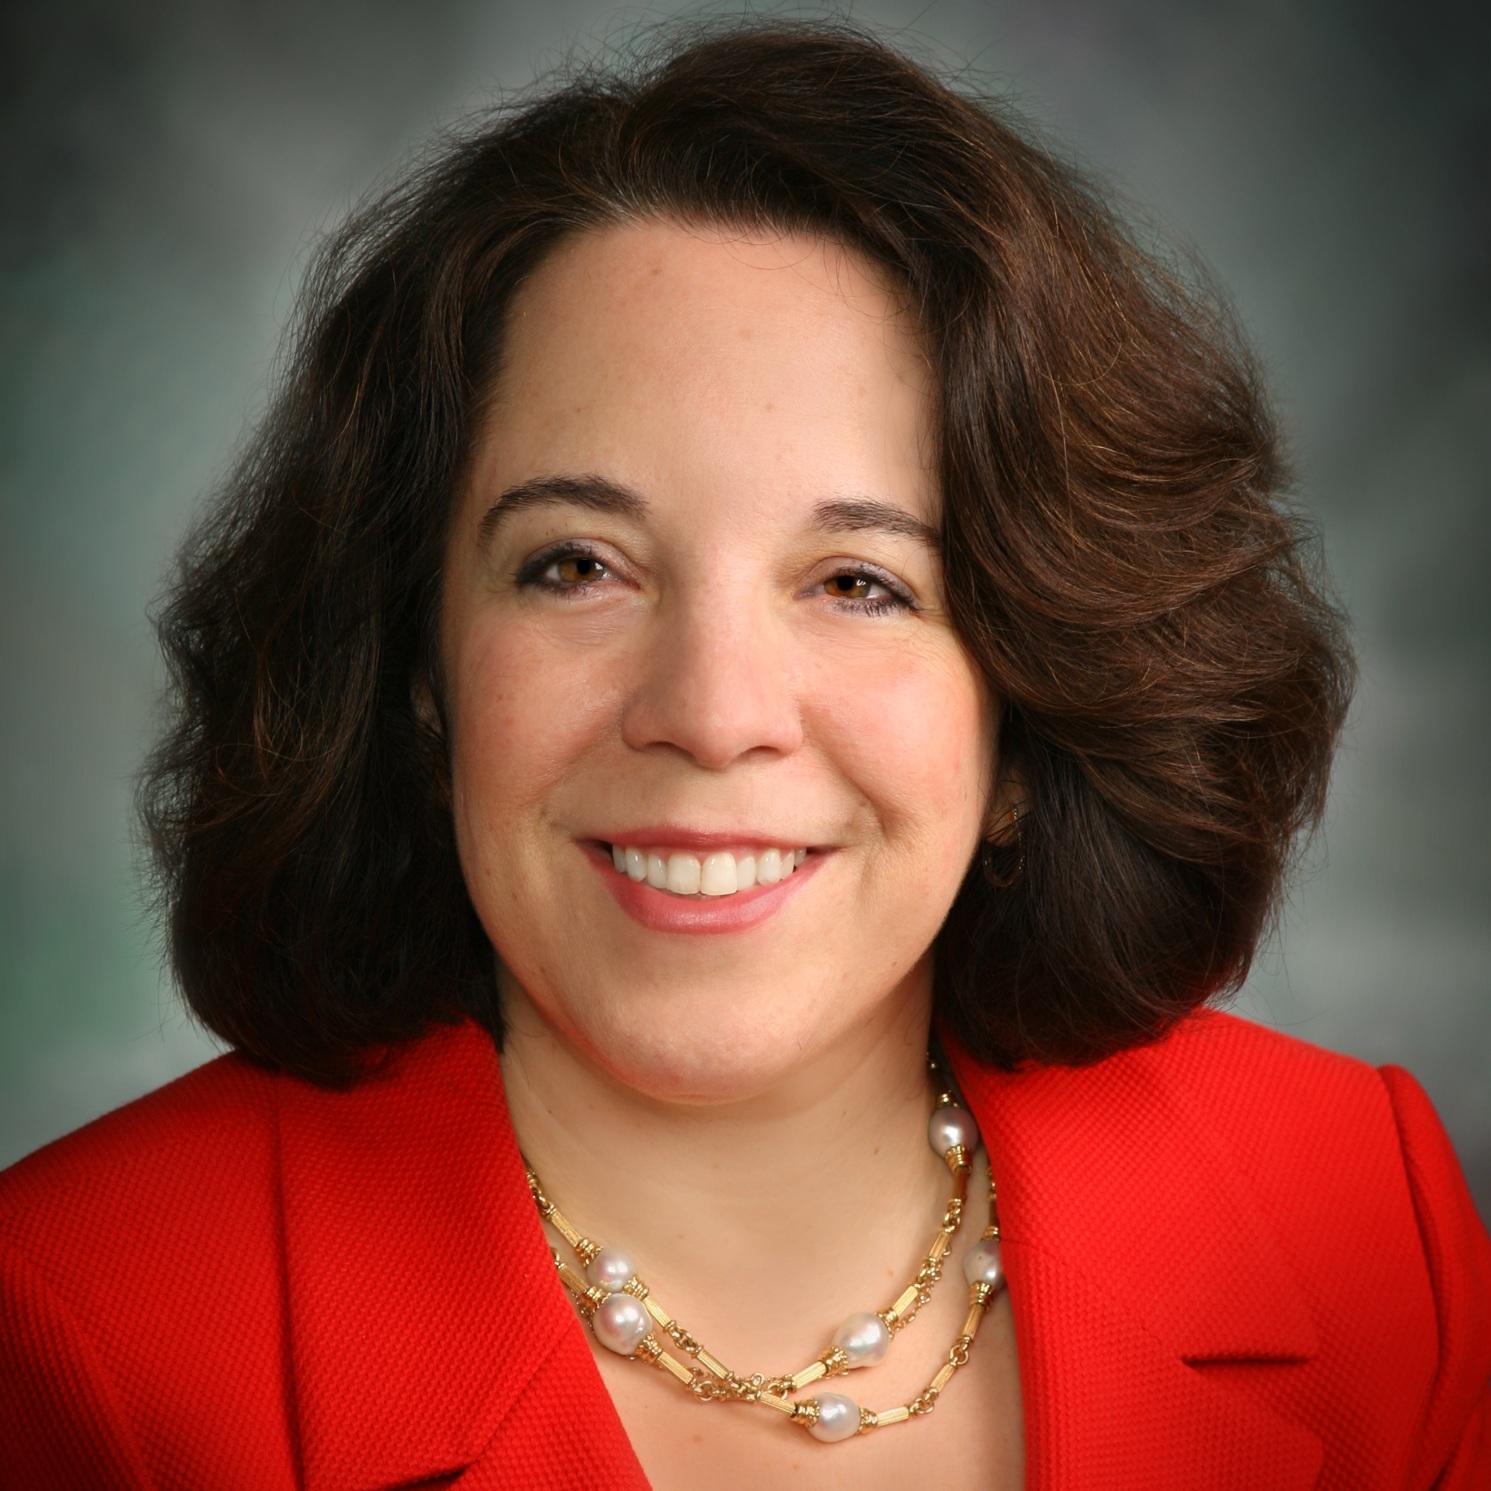 Jennifer Warren   Vice President of Technology Policy and Regulation  Lockheed Martin Corporation